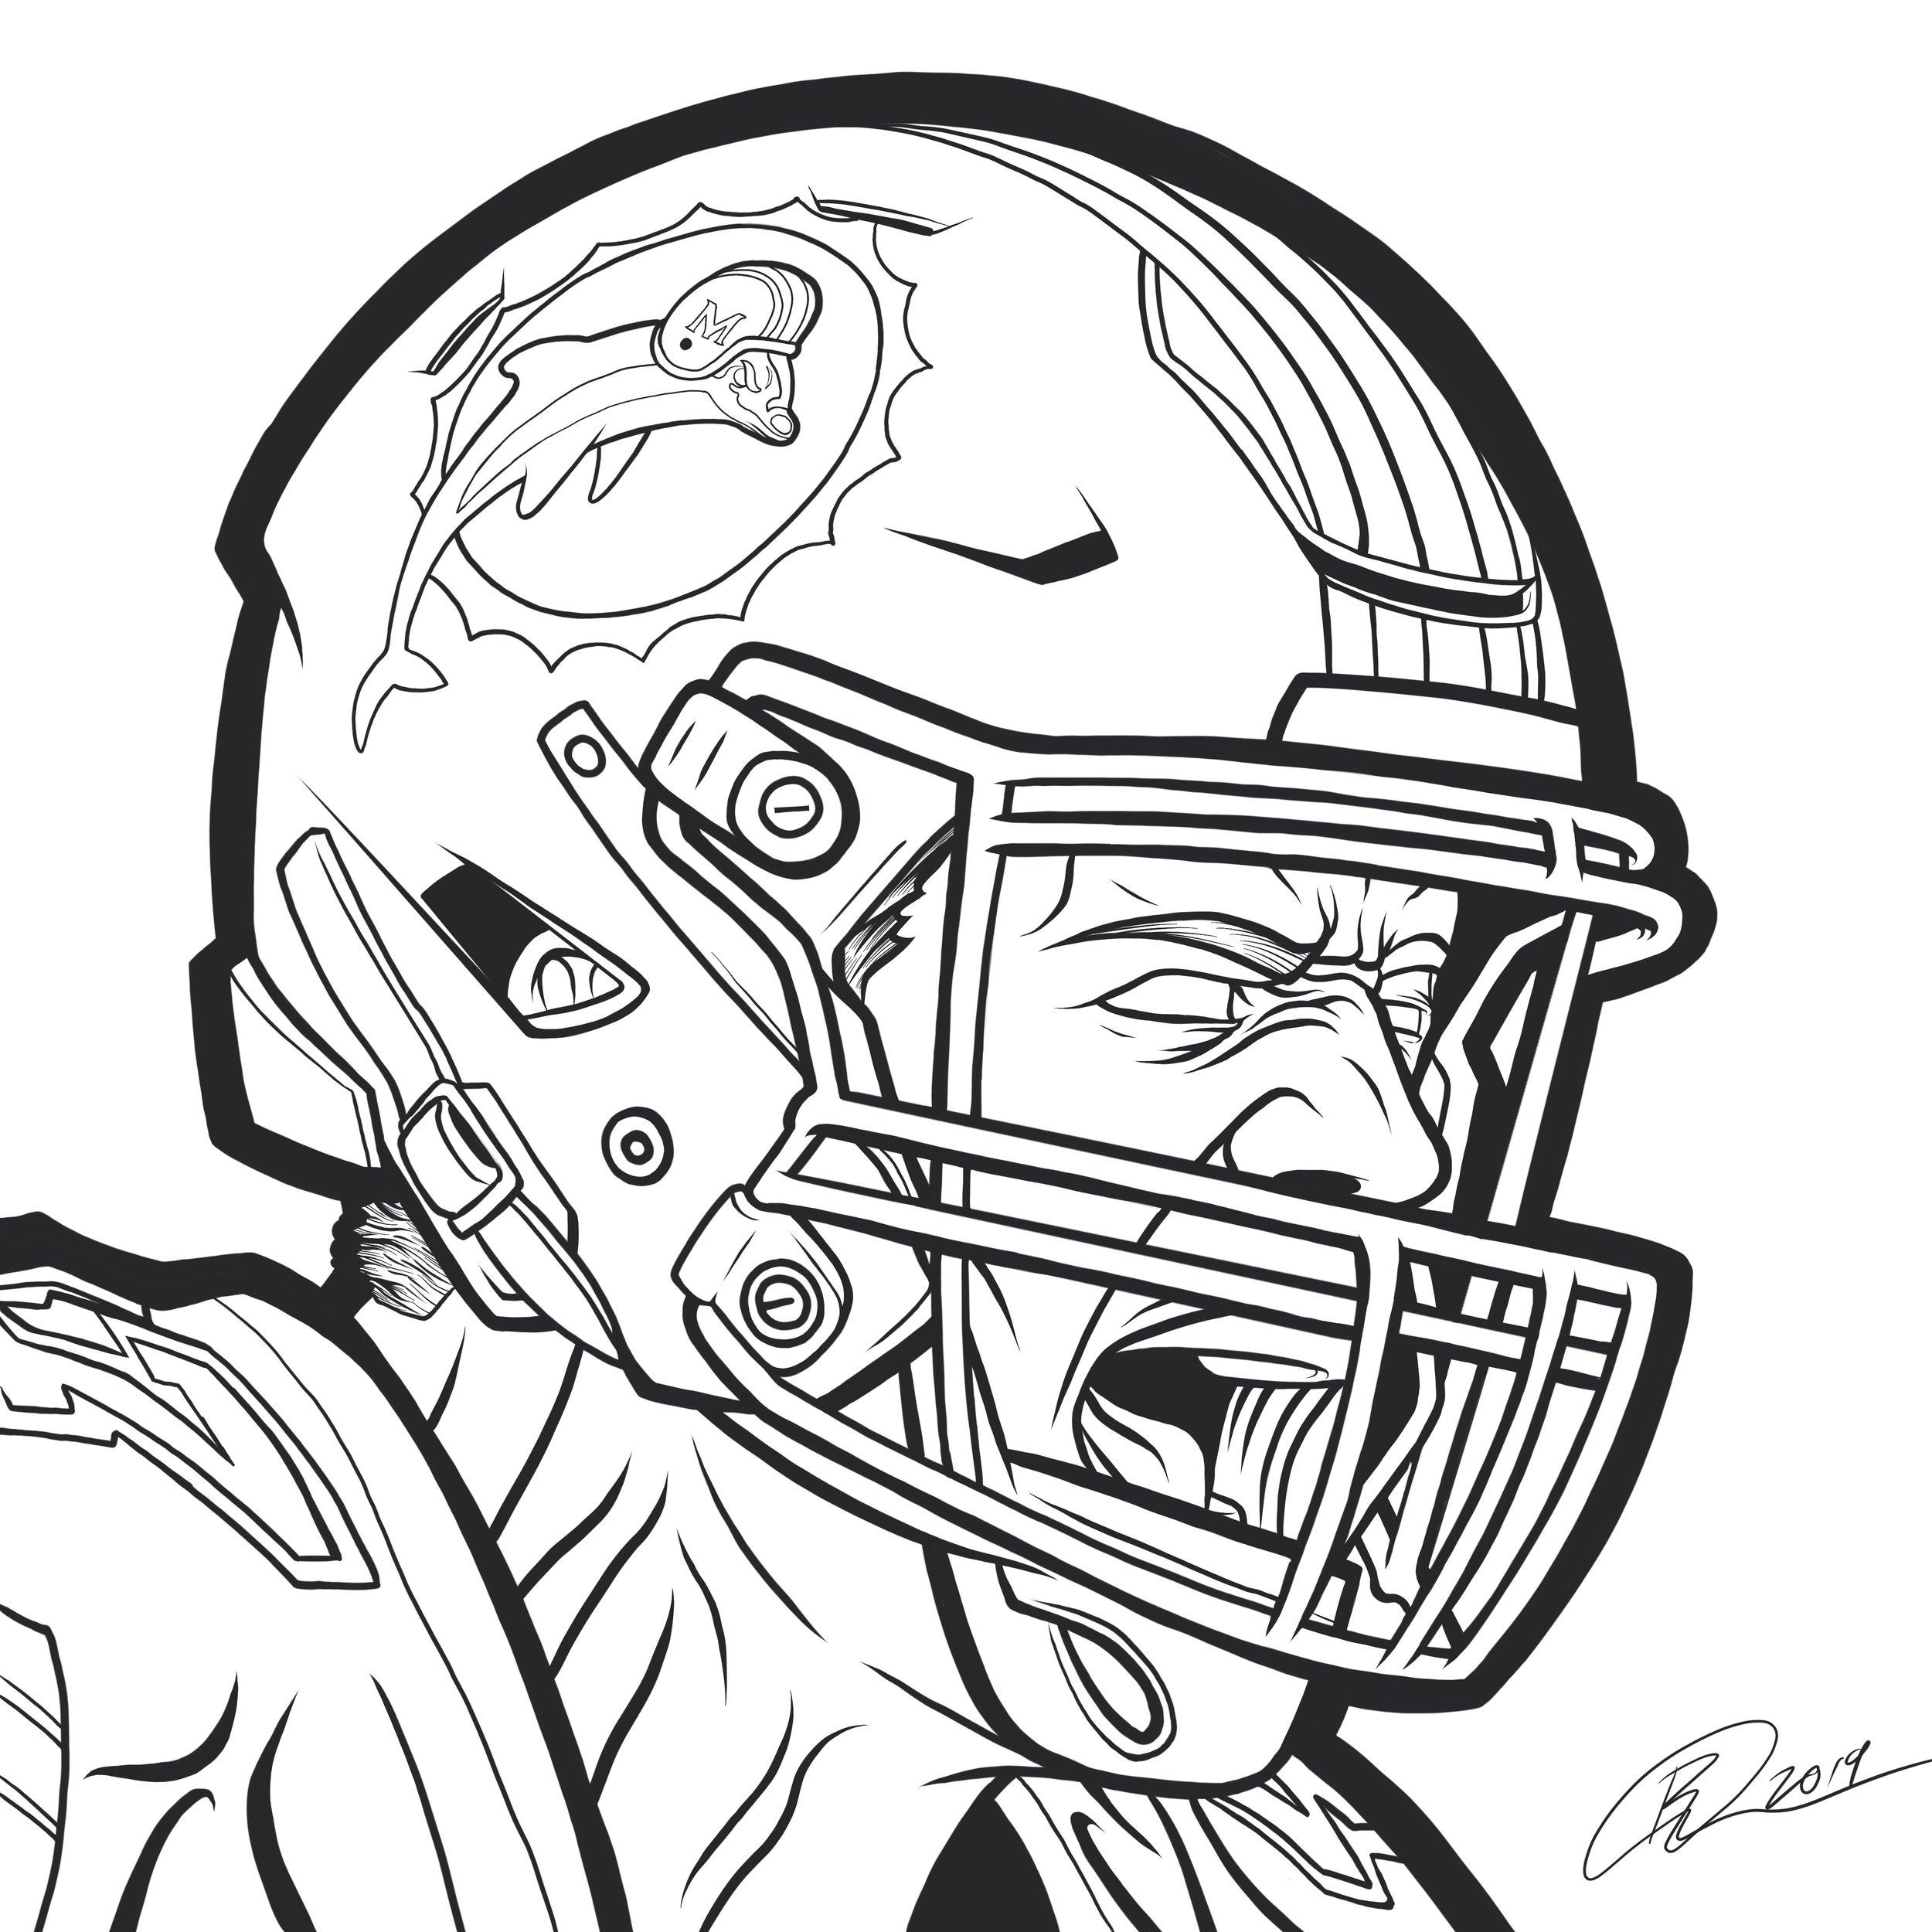 orozcodesign-miamidolphins-NFL-KikoAlonso-illustration-black .JPG